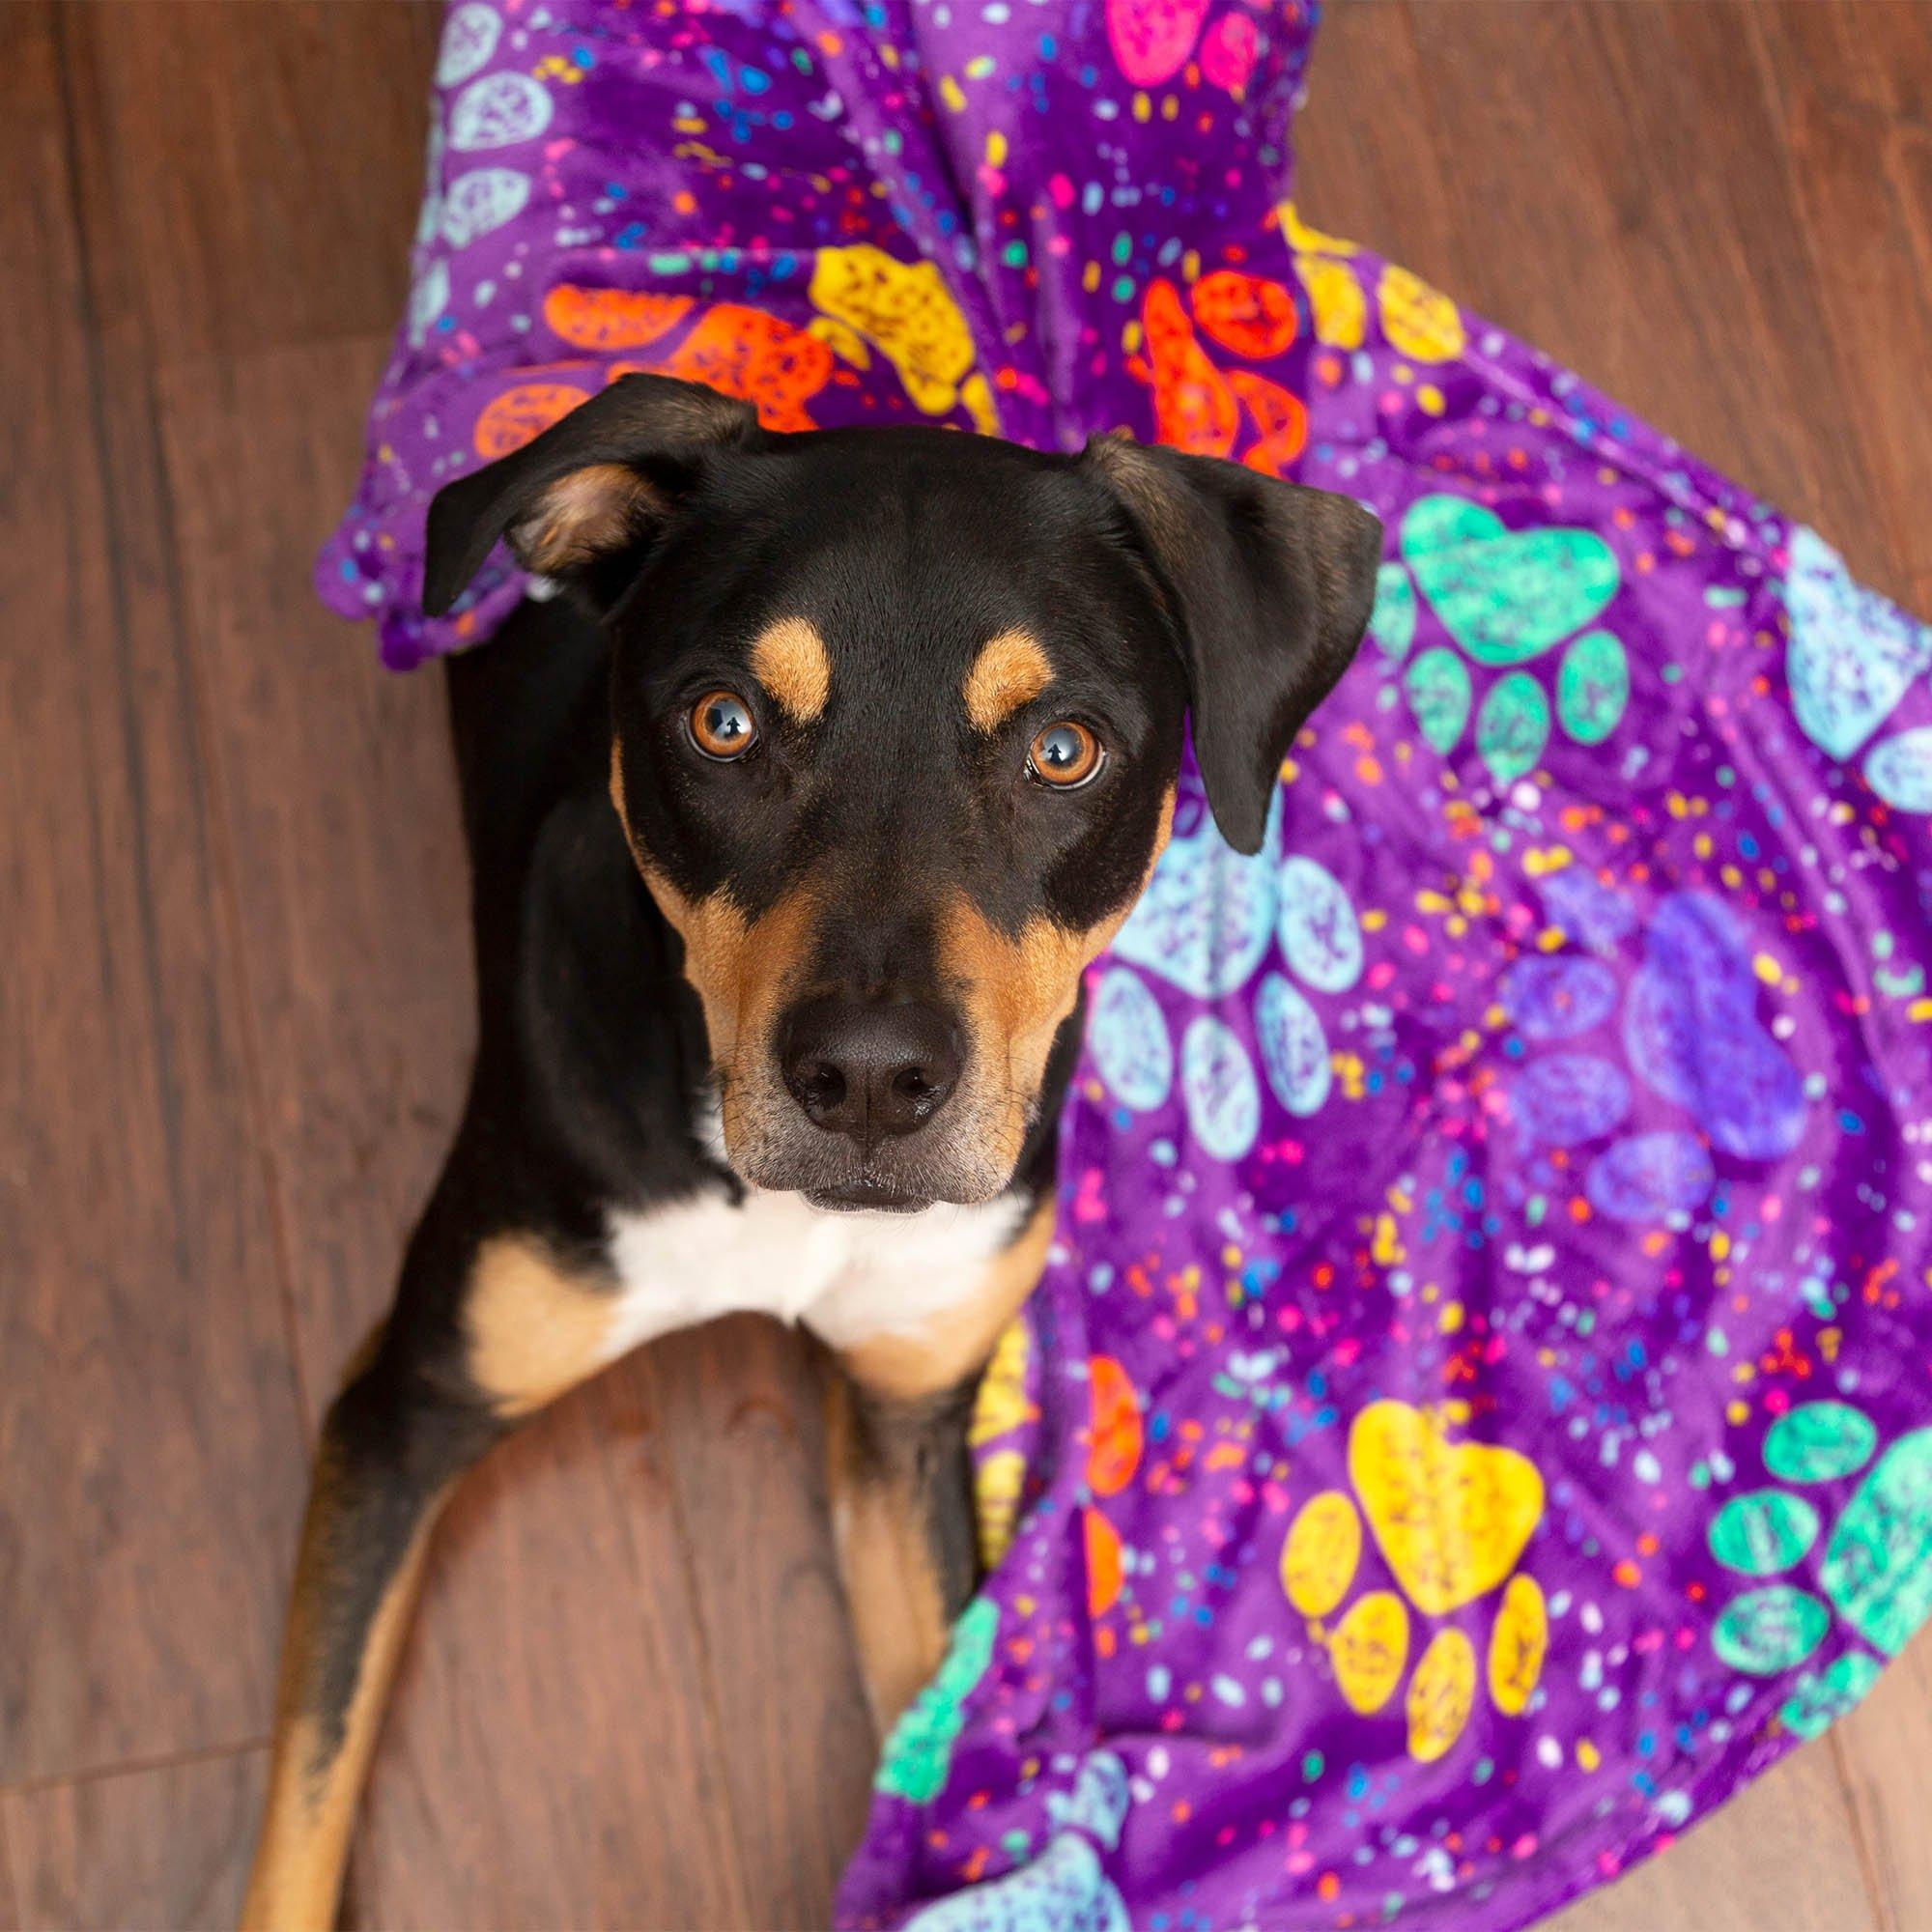 Snuggle Paws Fleece Pet Blanket Snuggle Fleece, $4.95 @theanimalrescuesite.com